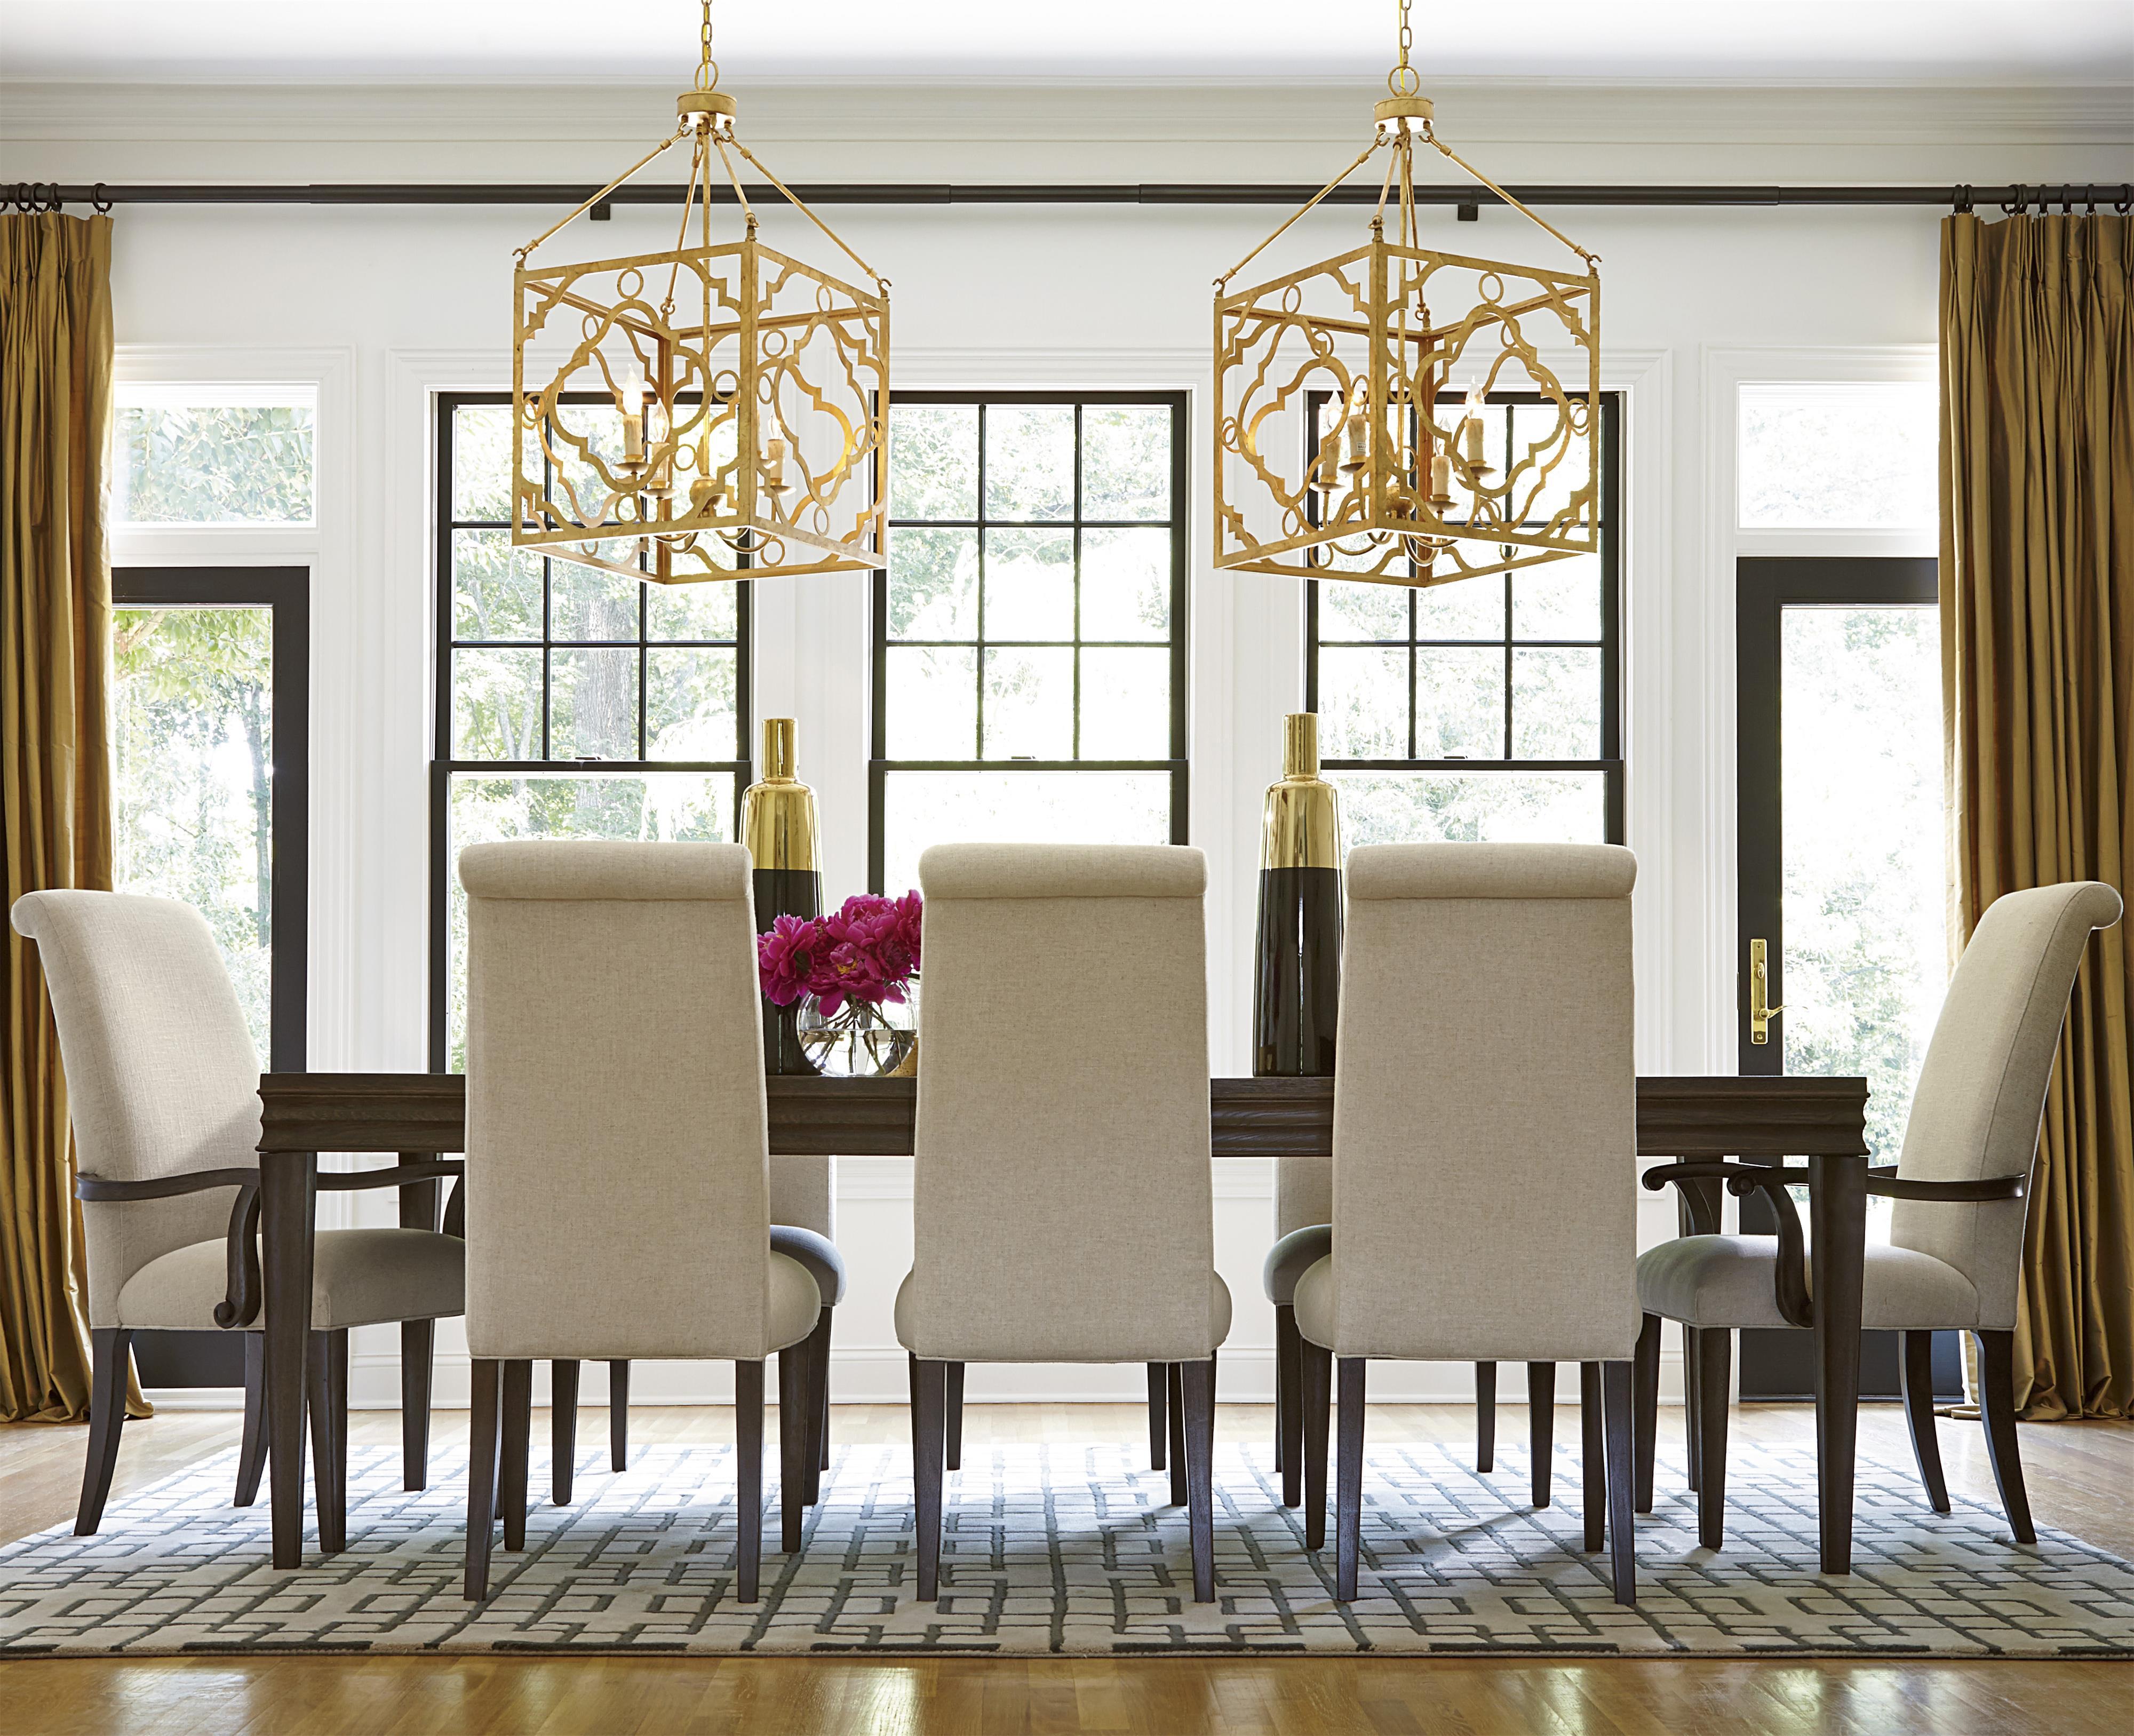 Universal California - Hollywood Hills 9 Piece Dining Set - Item Number: 475653+2x639-RTA+6x638-RTA